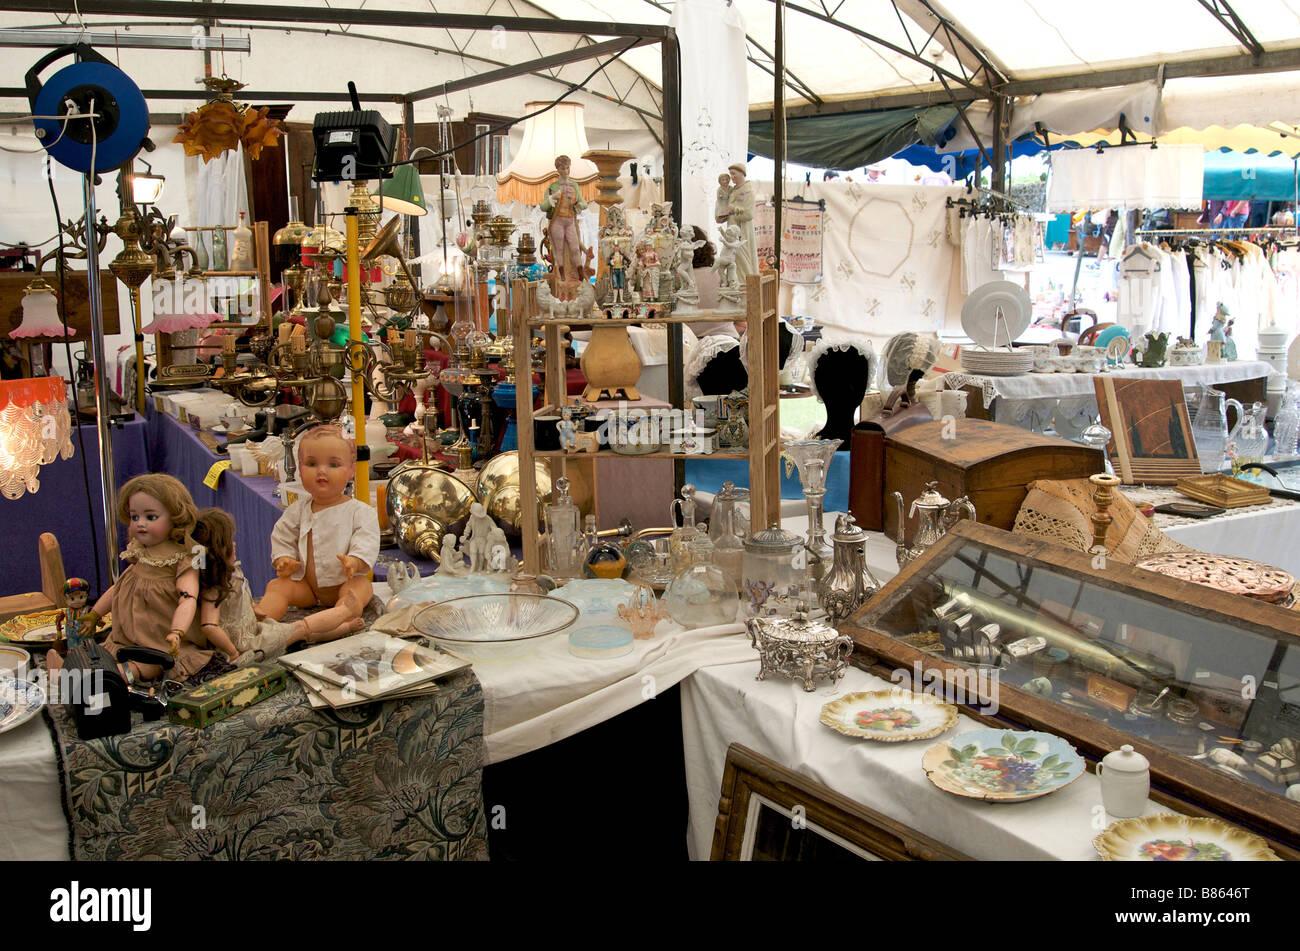 Flea market / antiques fair / markets stalls - Stock Image